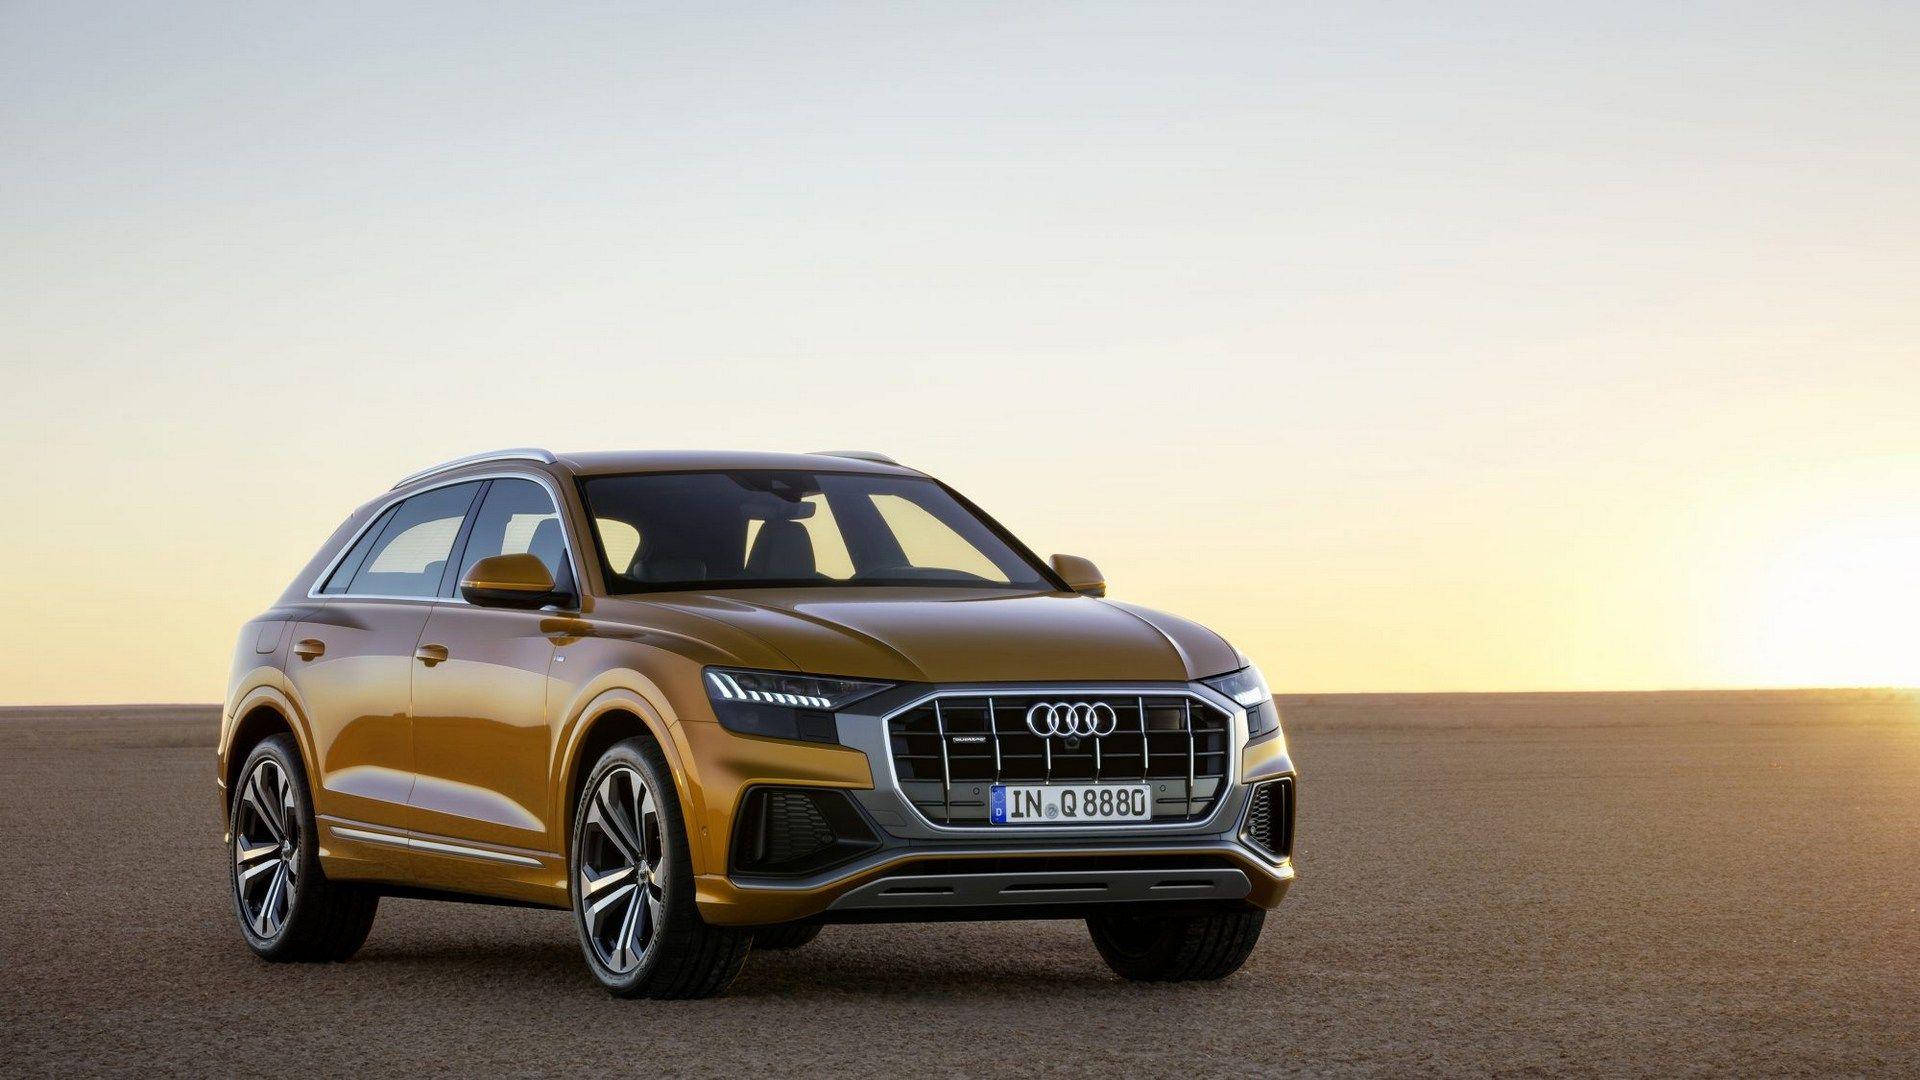 Audi Q8 2018 First Photos (4)